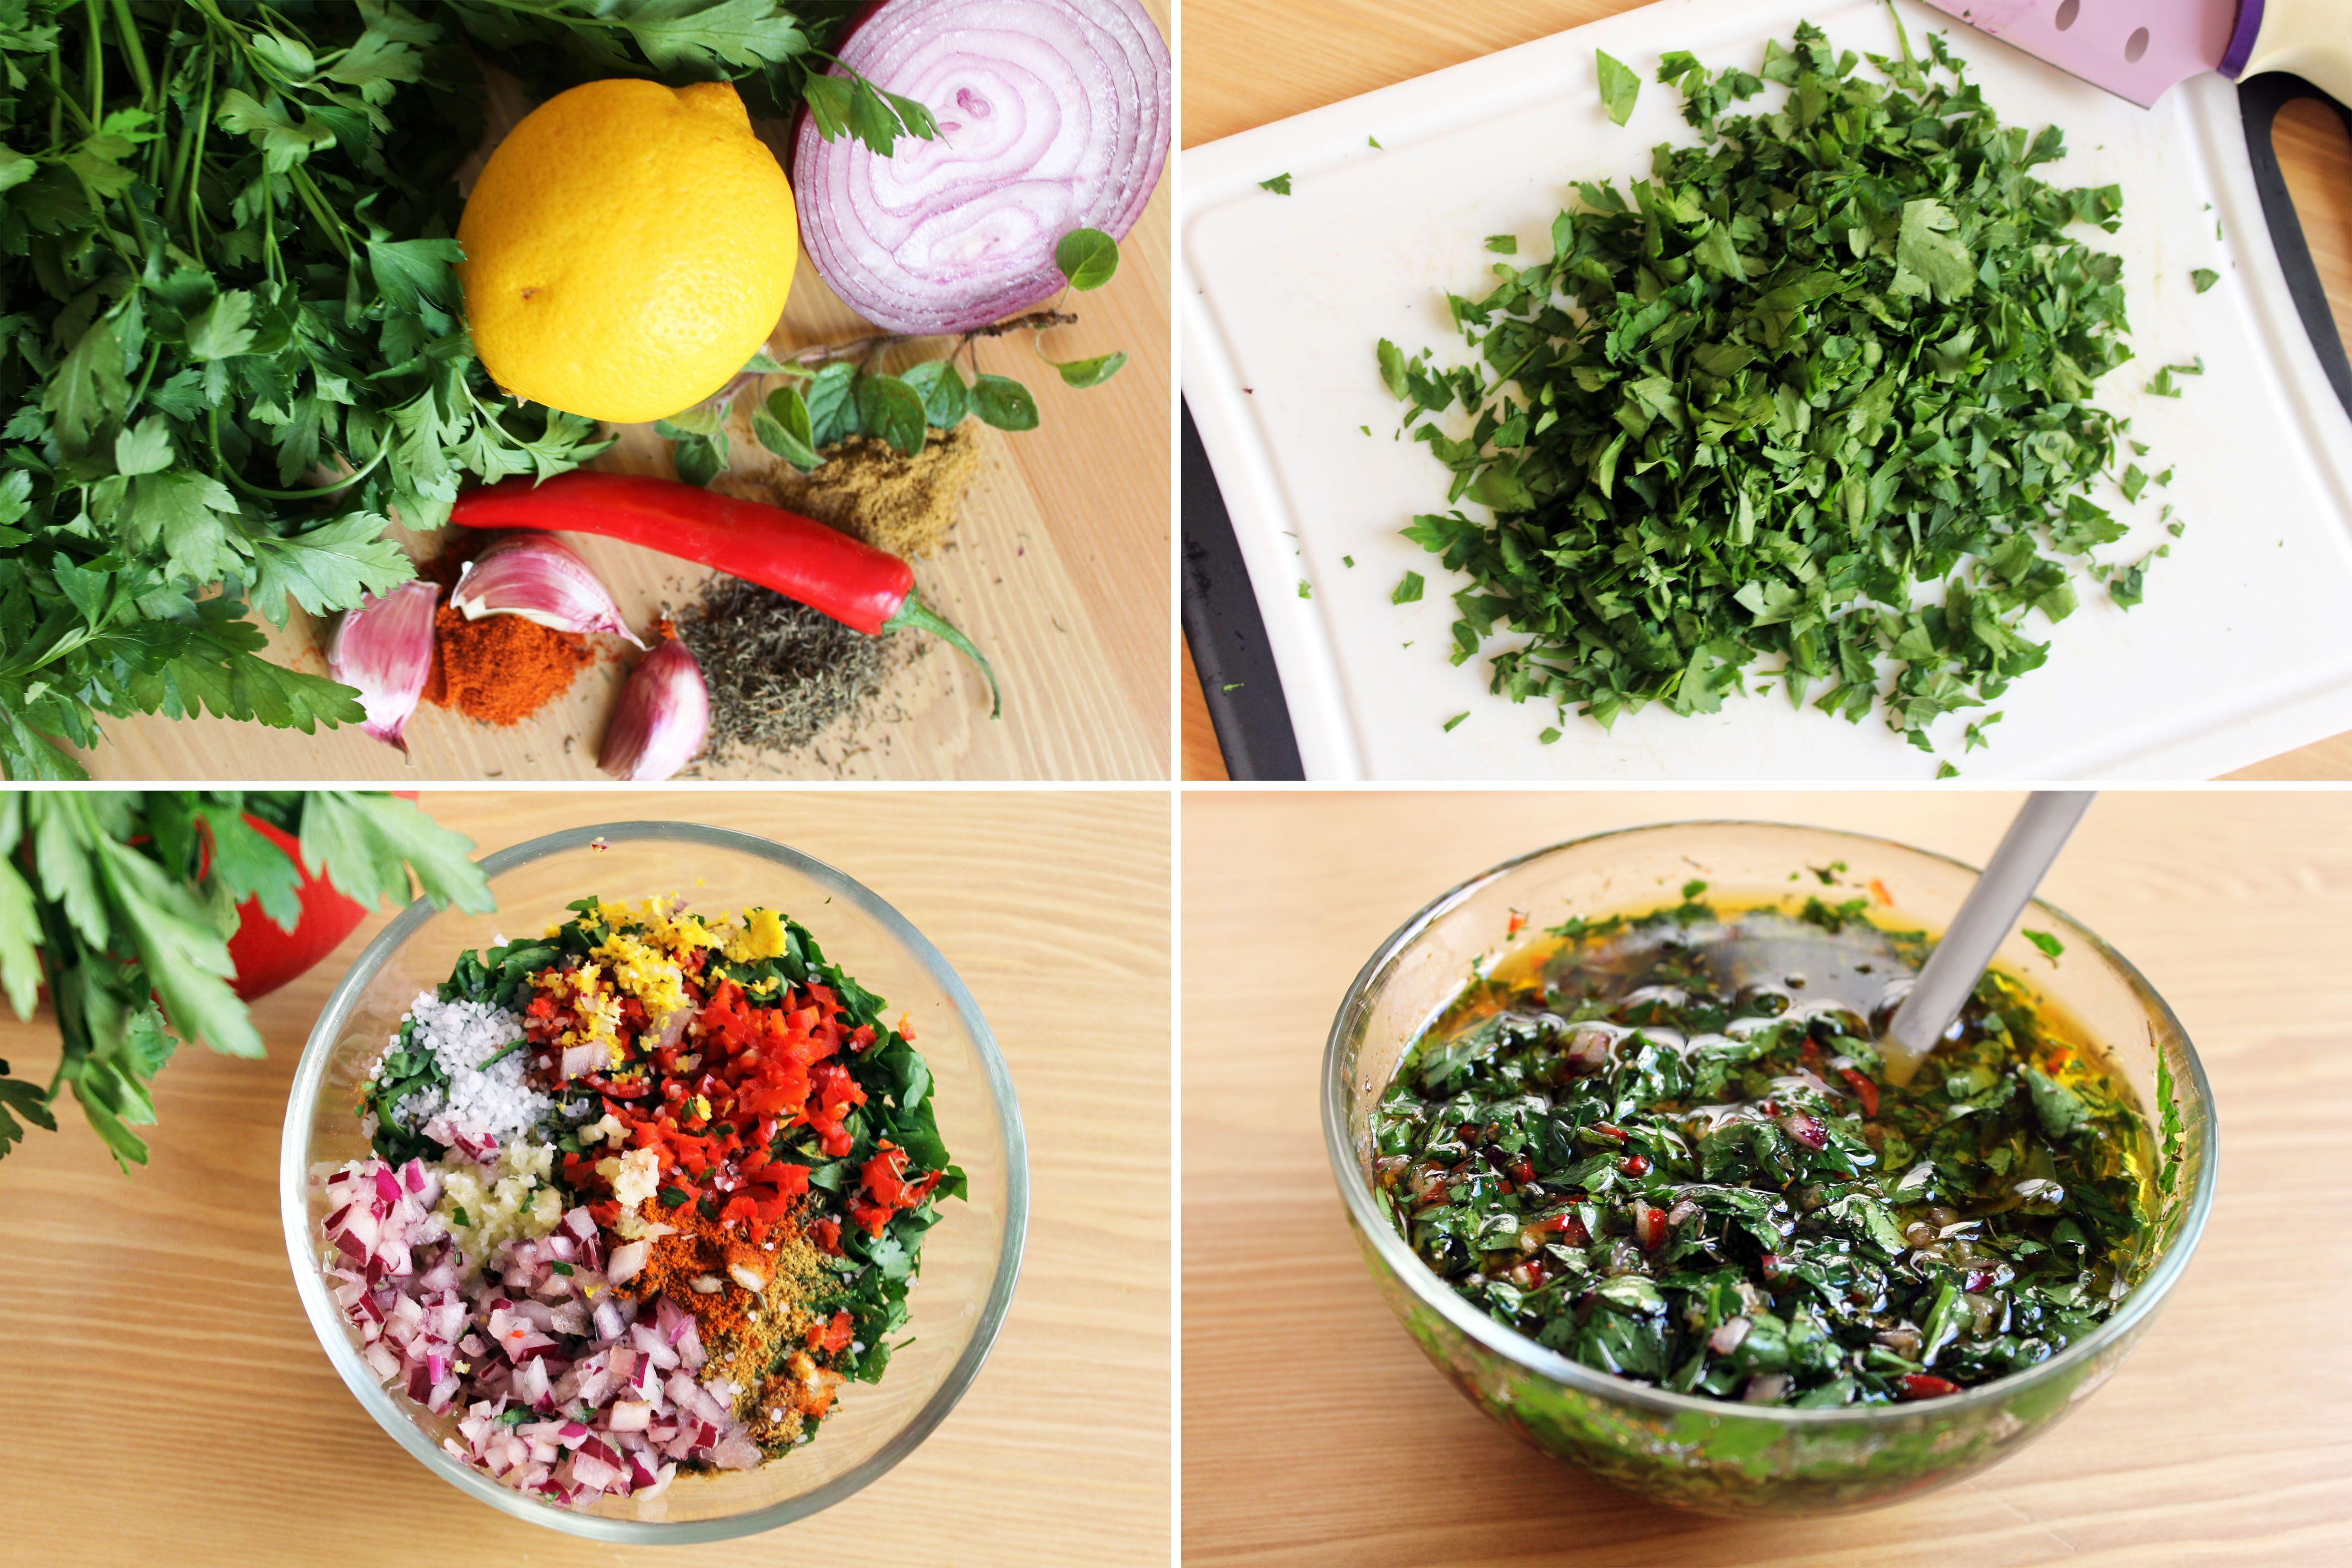 Cmo hacer salsa chimichurri receta argentina chimichurri salsa recipes cmo hacer salsa chimichurri receta argentina forumfinder Gallery